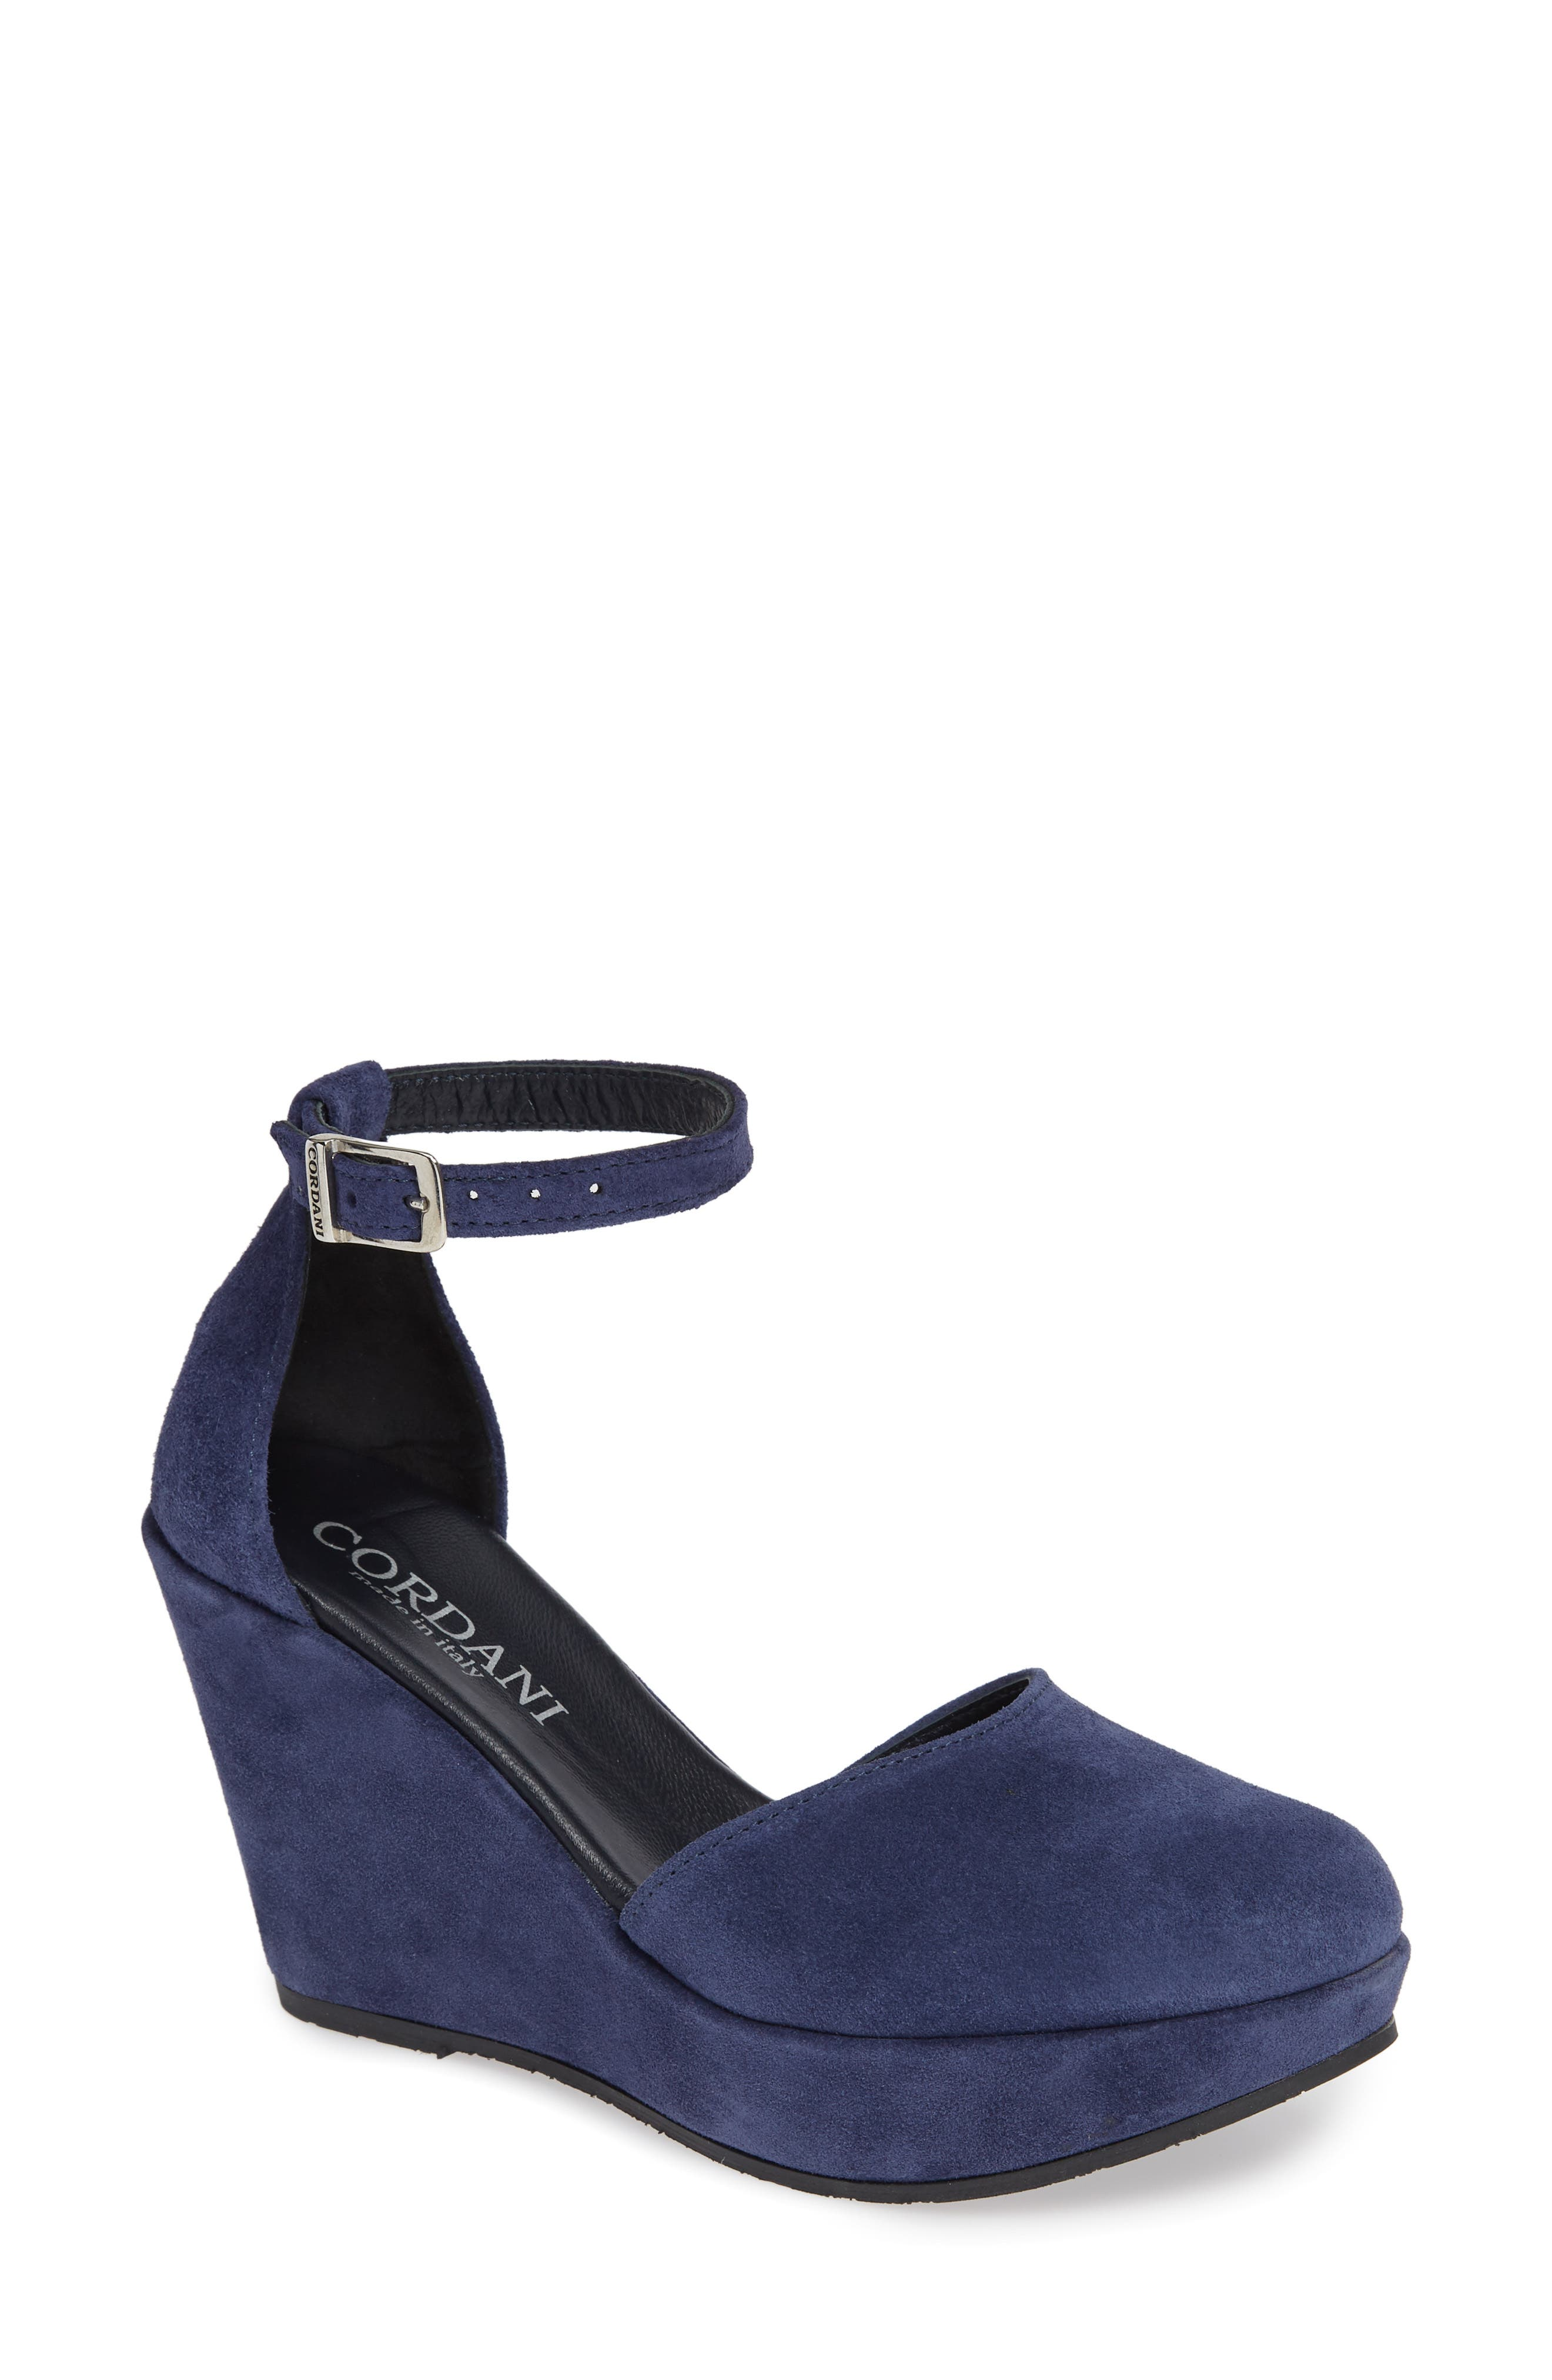 Cordani Robbins Wedge Pump - Blue